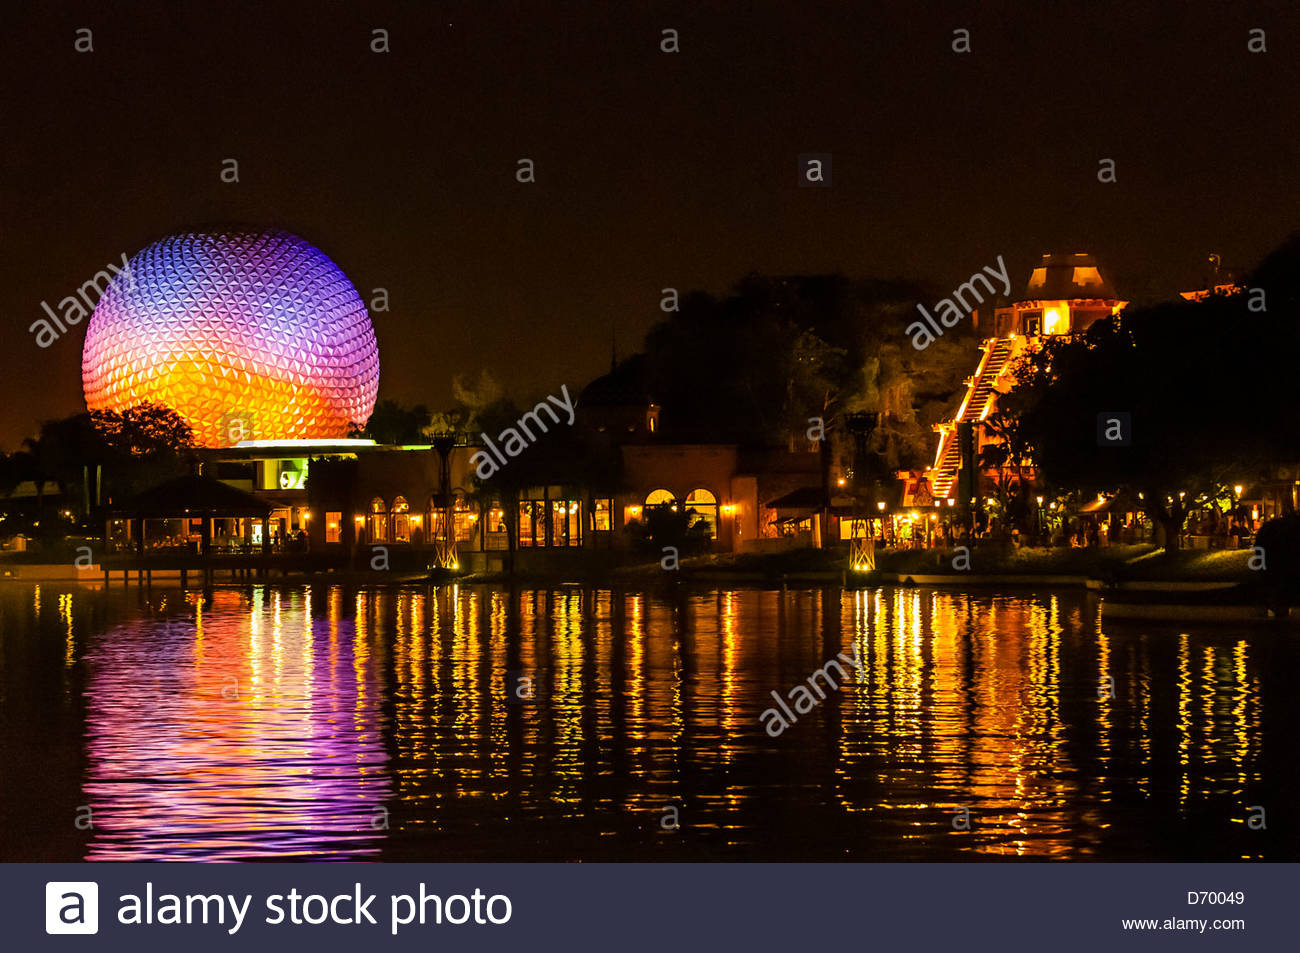 World Showcase Lagoon with Spaceship Earth (geosphere) in background, Epcot, Walt Disney World, Orlando, Florida - Stock Image